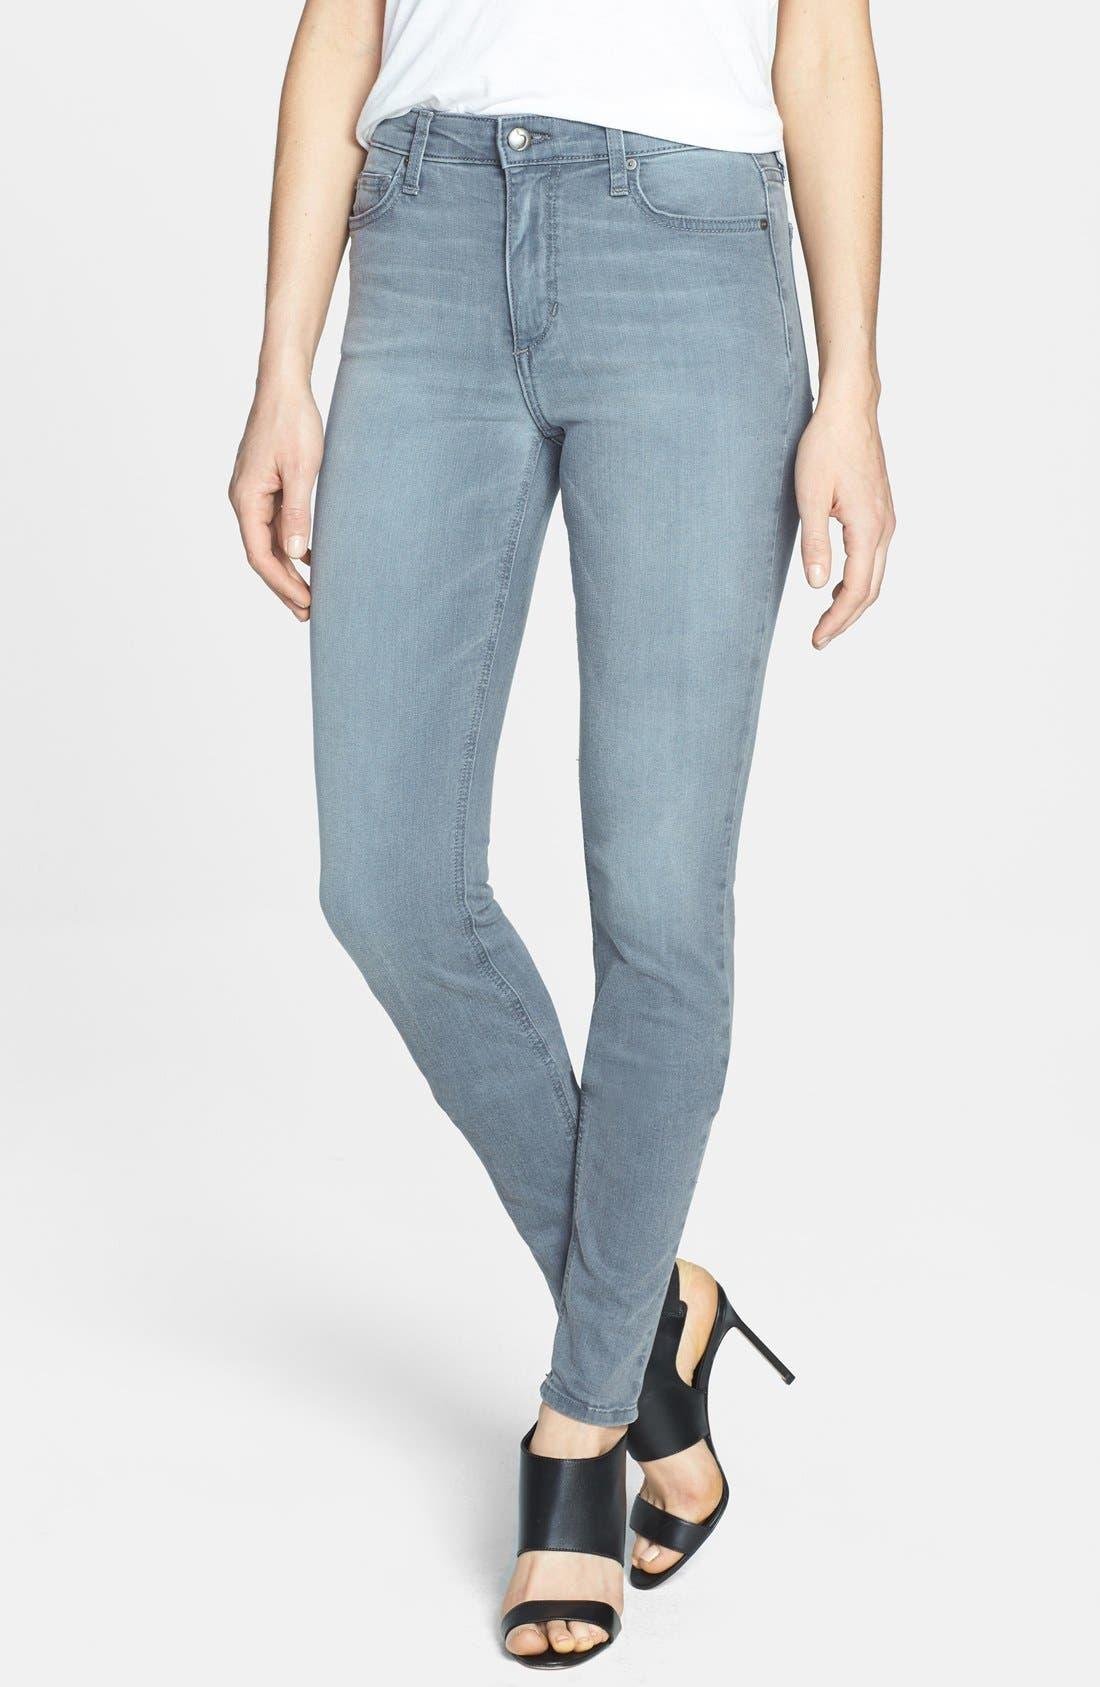 Alternate Image 1 Selected - Joe's 'Flawless' High Rise Skinny Jeans (Rakel)